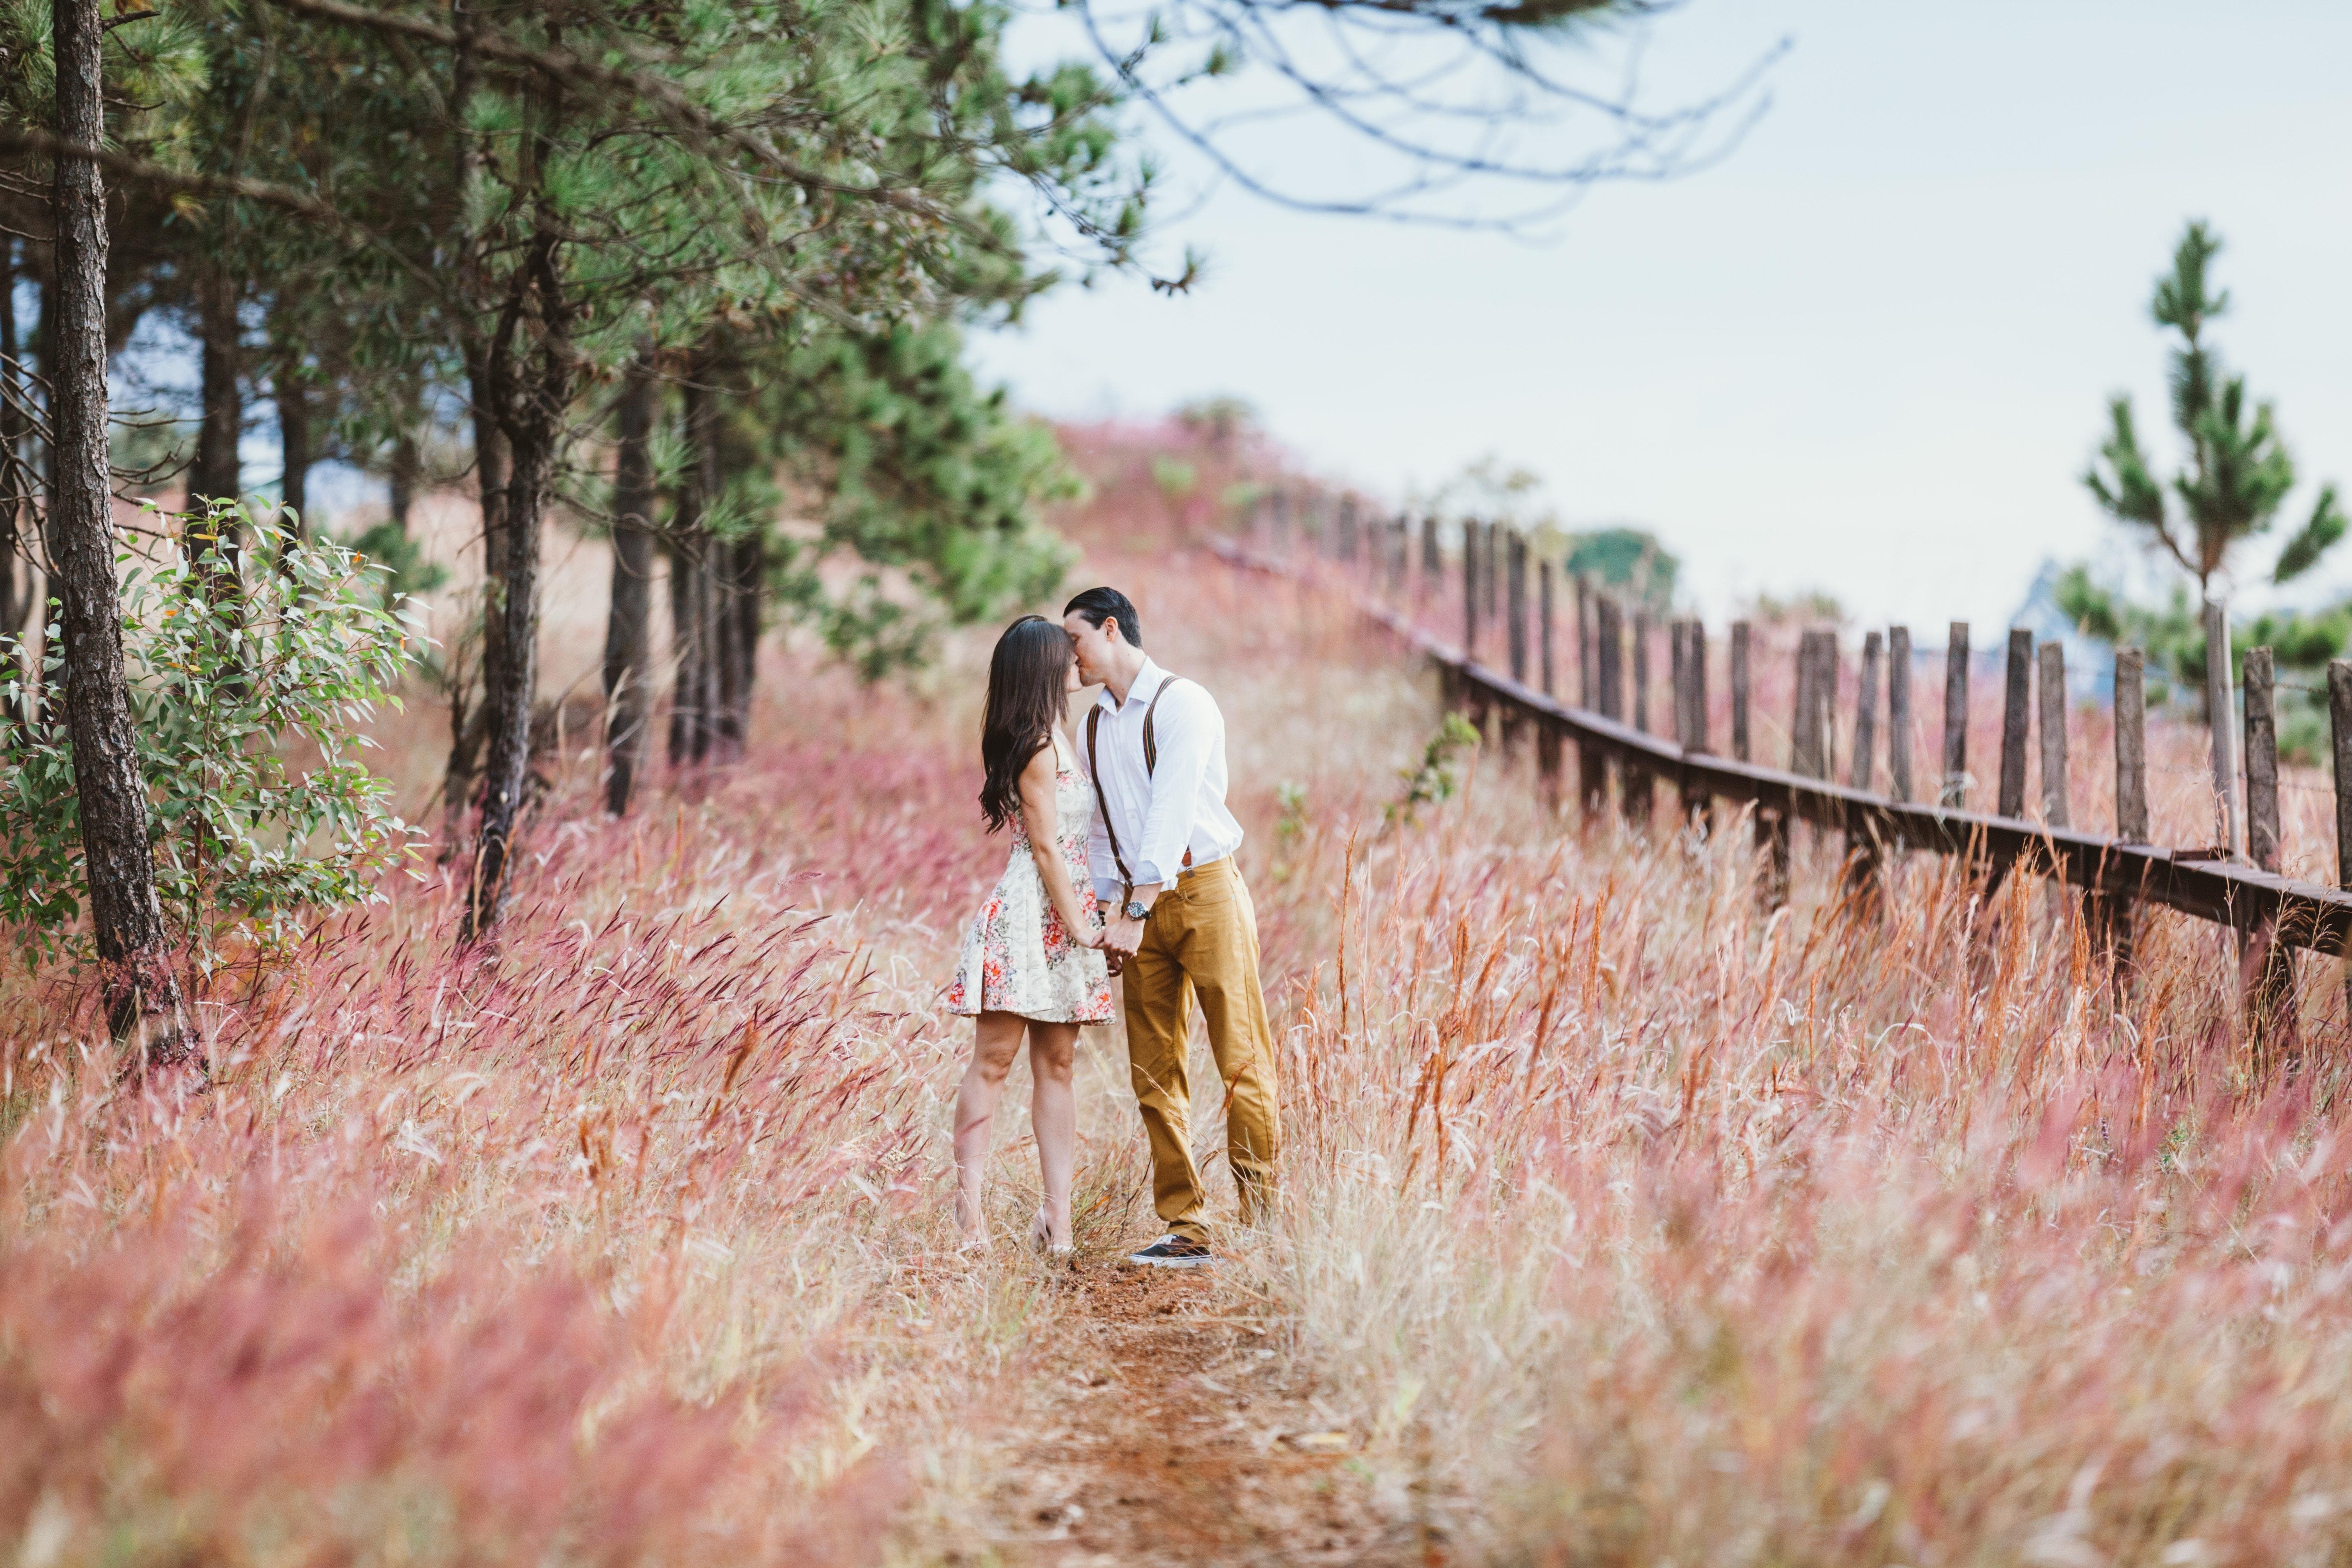 adult-beautiful-blur-bride-219776